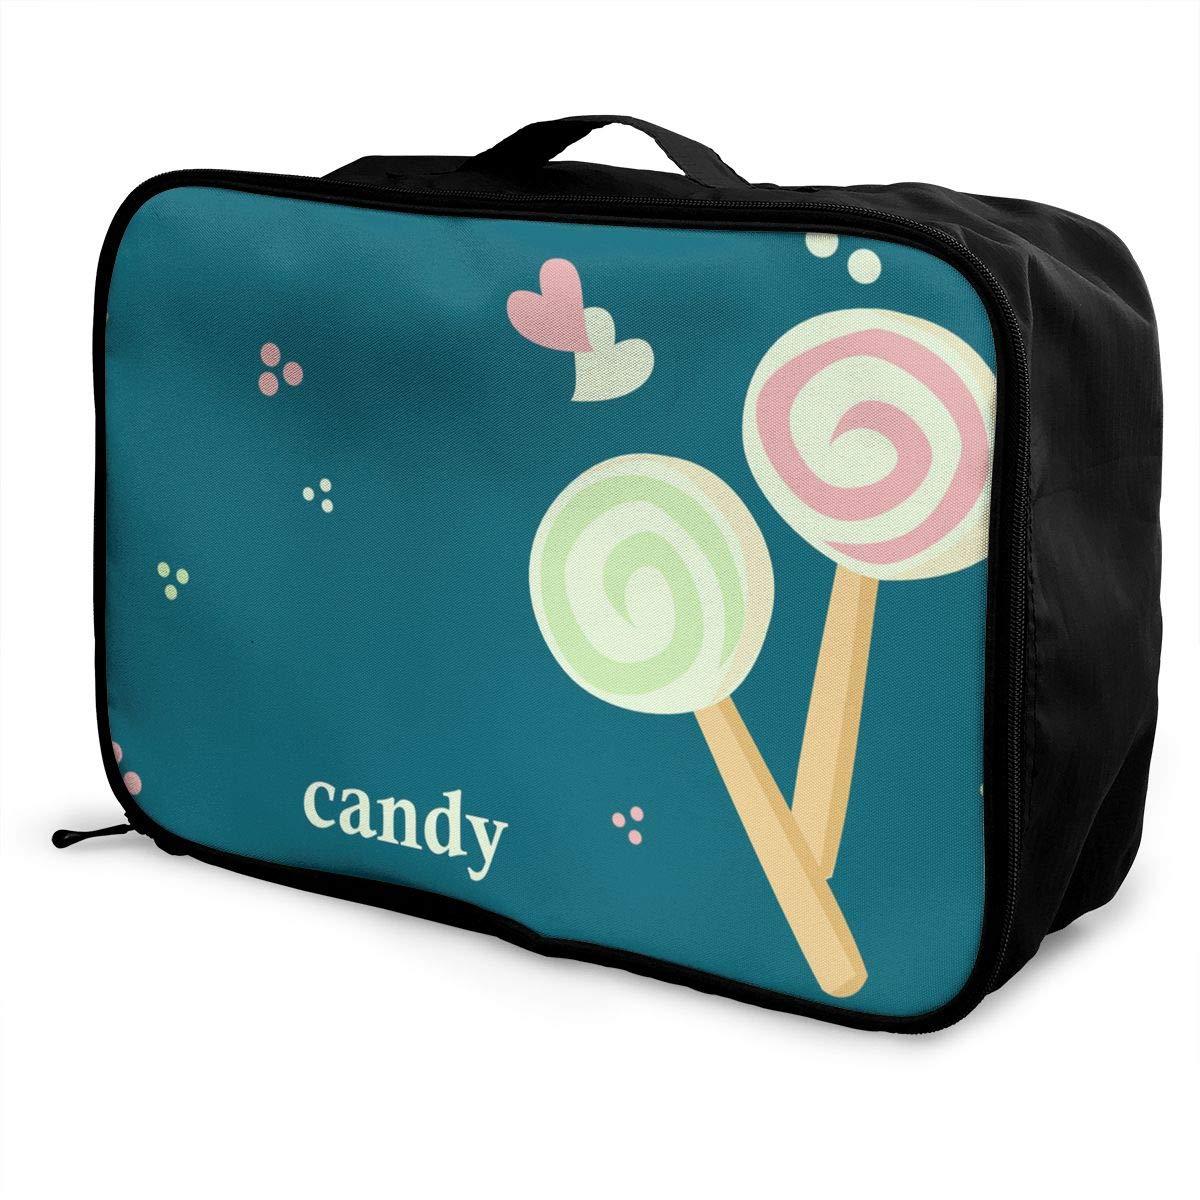 Travel Luggage Duffle Bag Lightweight Portable Handbag Its Over Large Capacity Waterproof Foldable Storage Tote